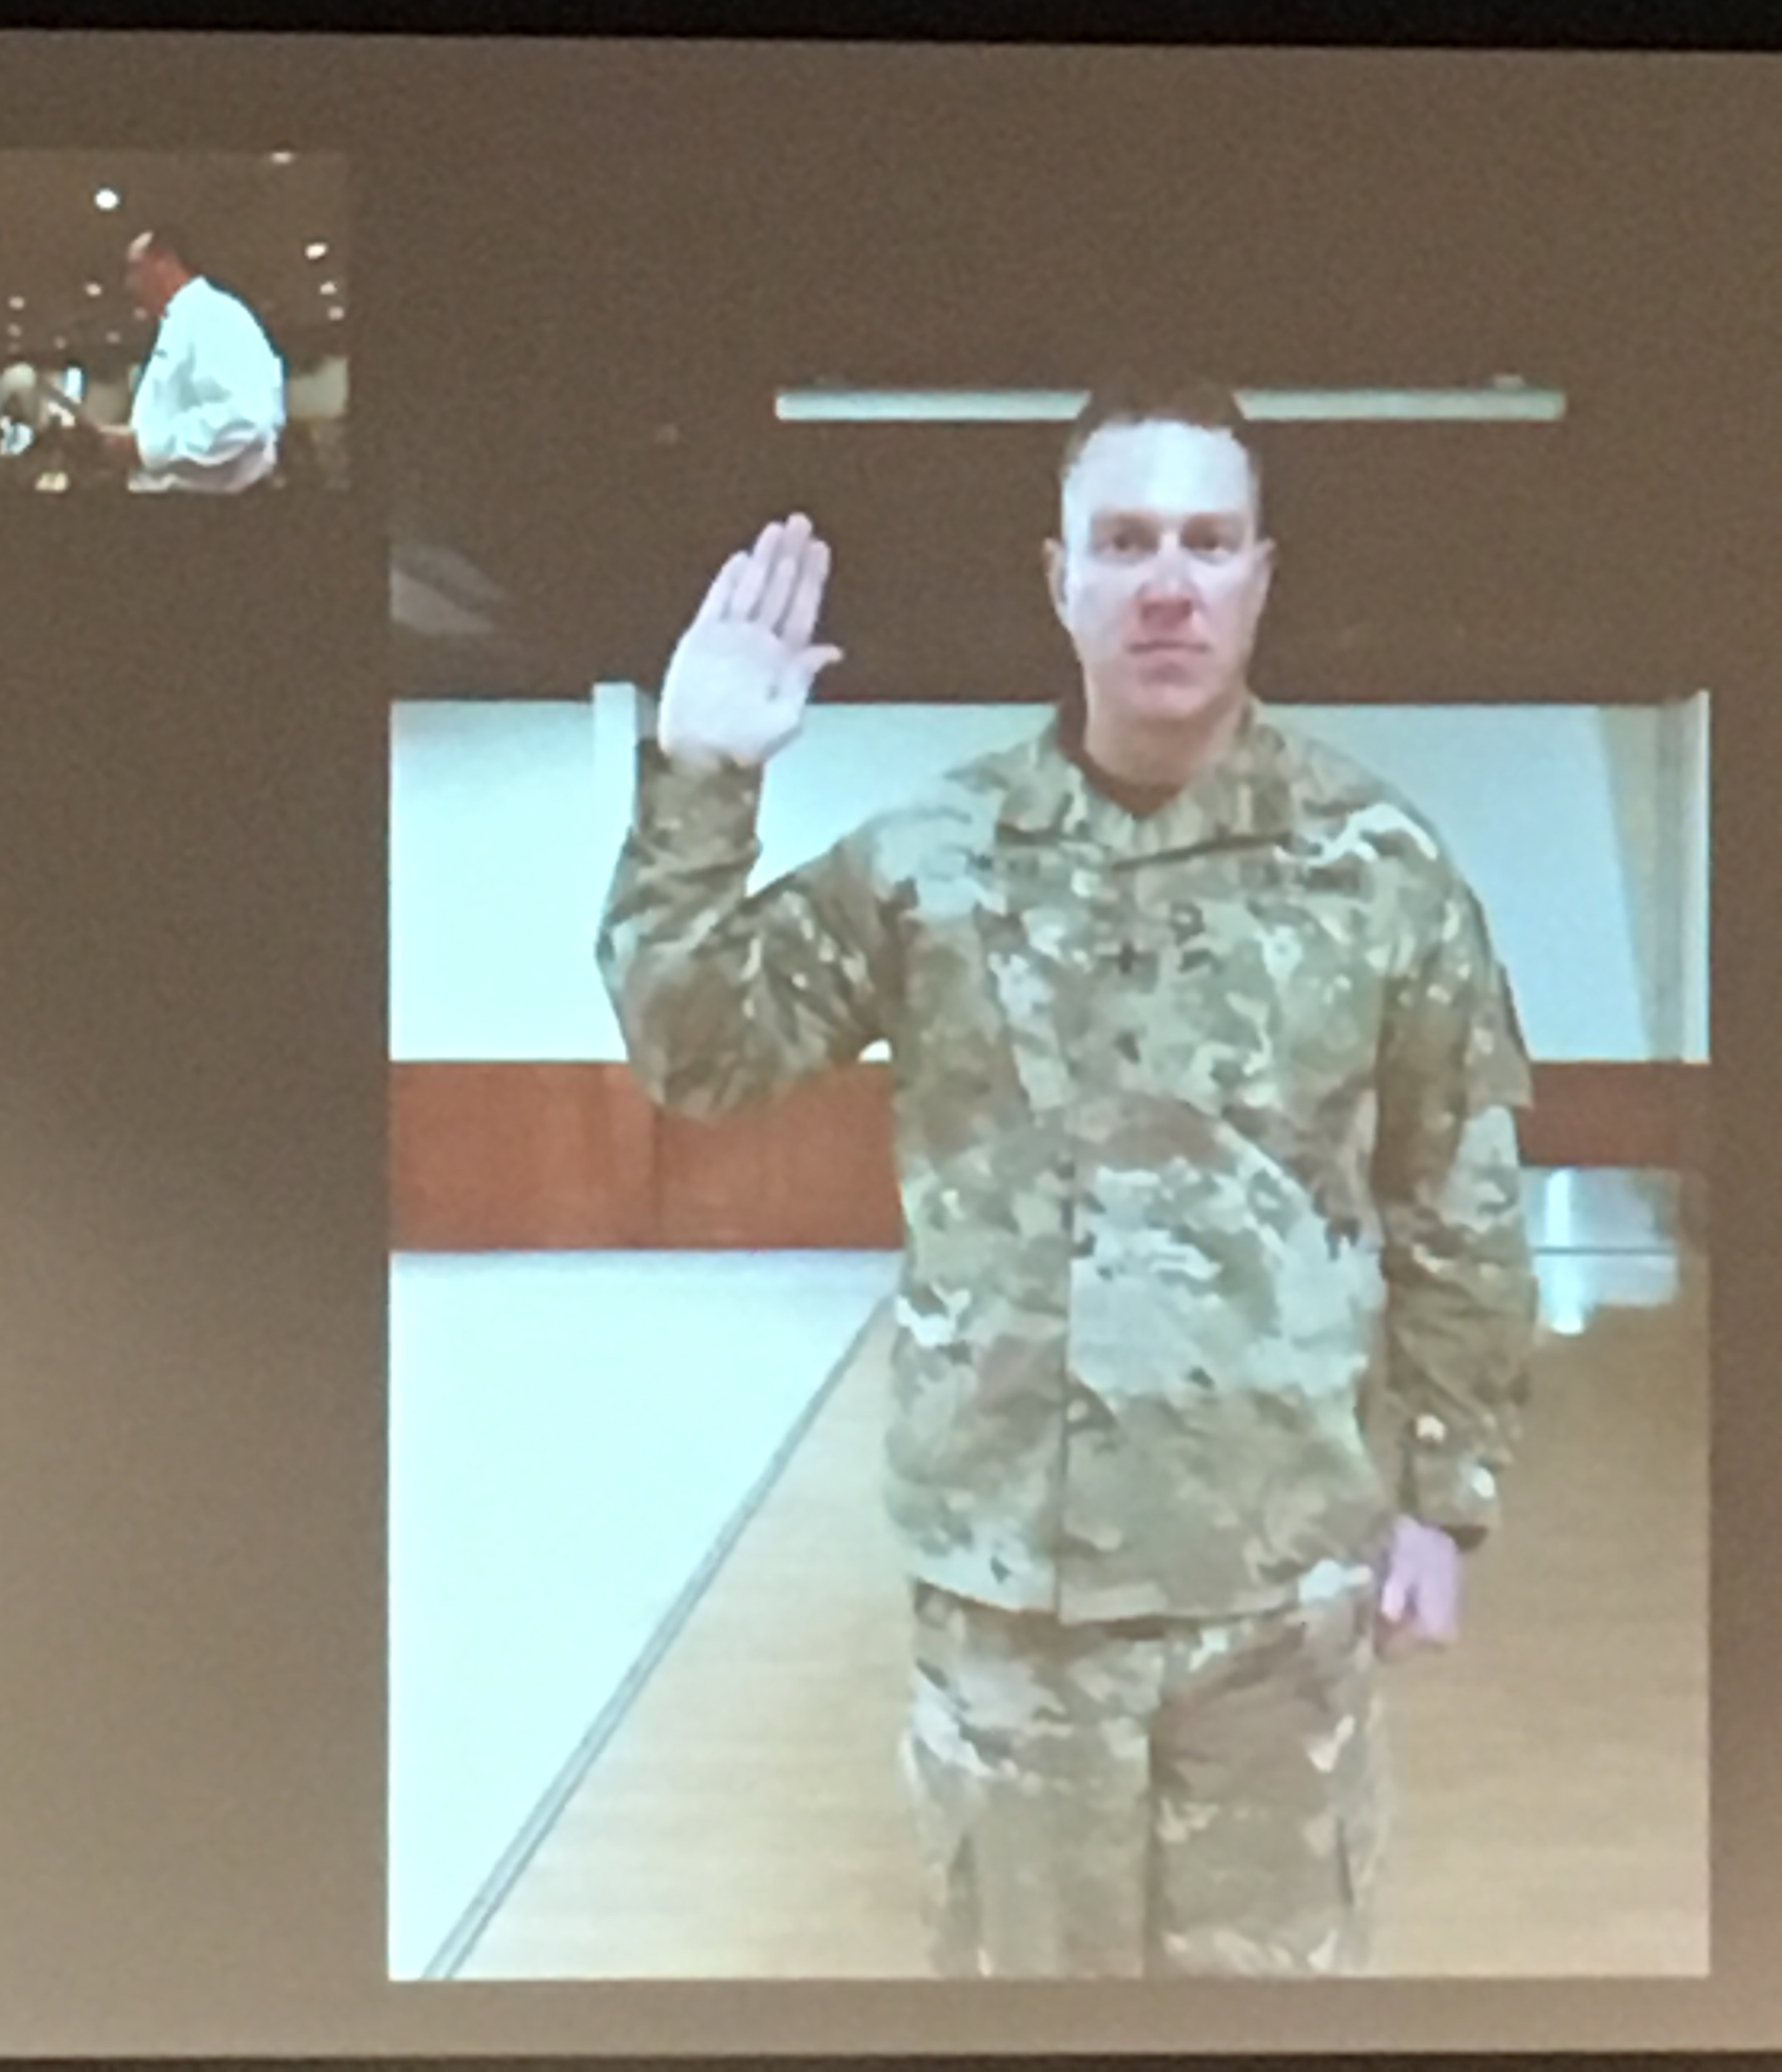 Captain Ben Hicks recites the oath for the position of captain via Facetime.